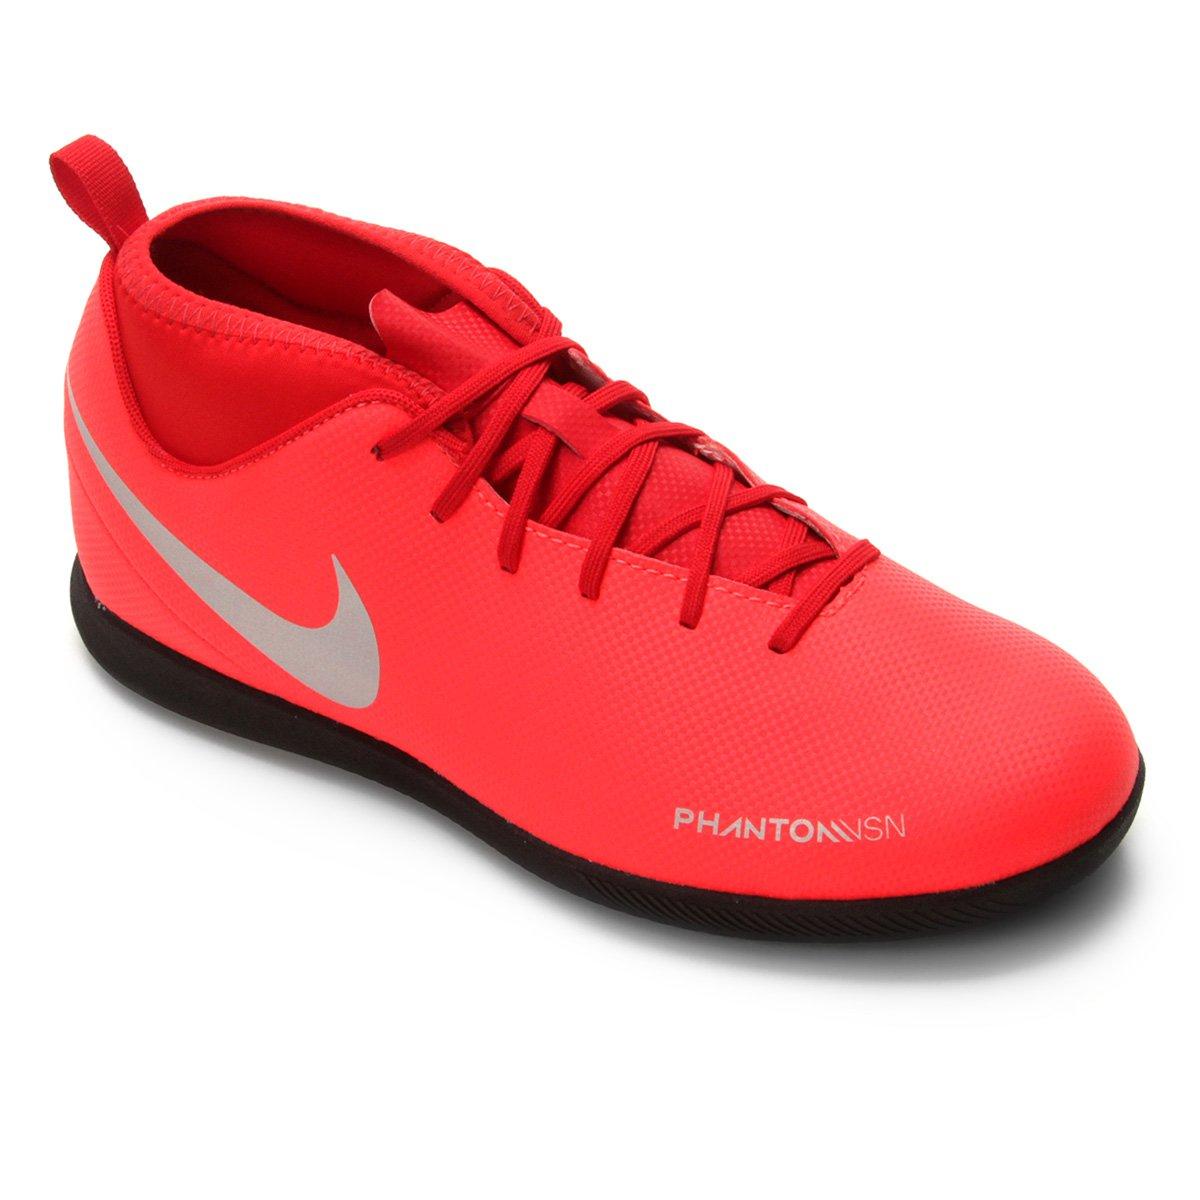 bc7ba46384ce4 Chuteira Futsal Infantil Nike Phantom Vision Club DF IC - Tam: 36 ...